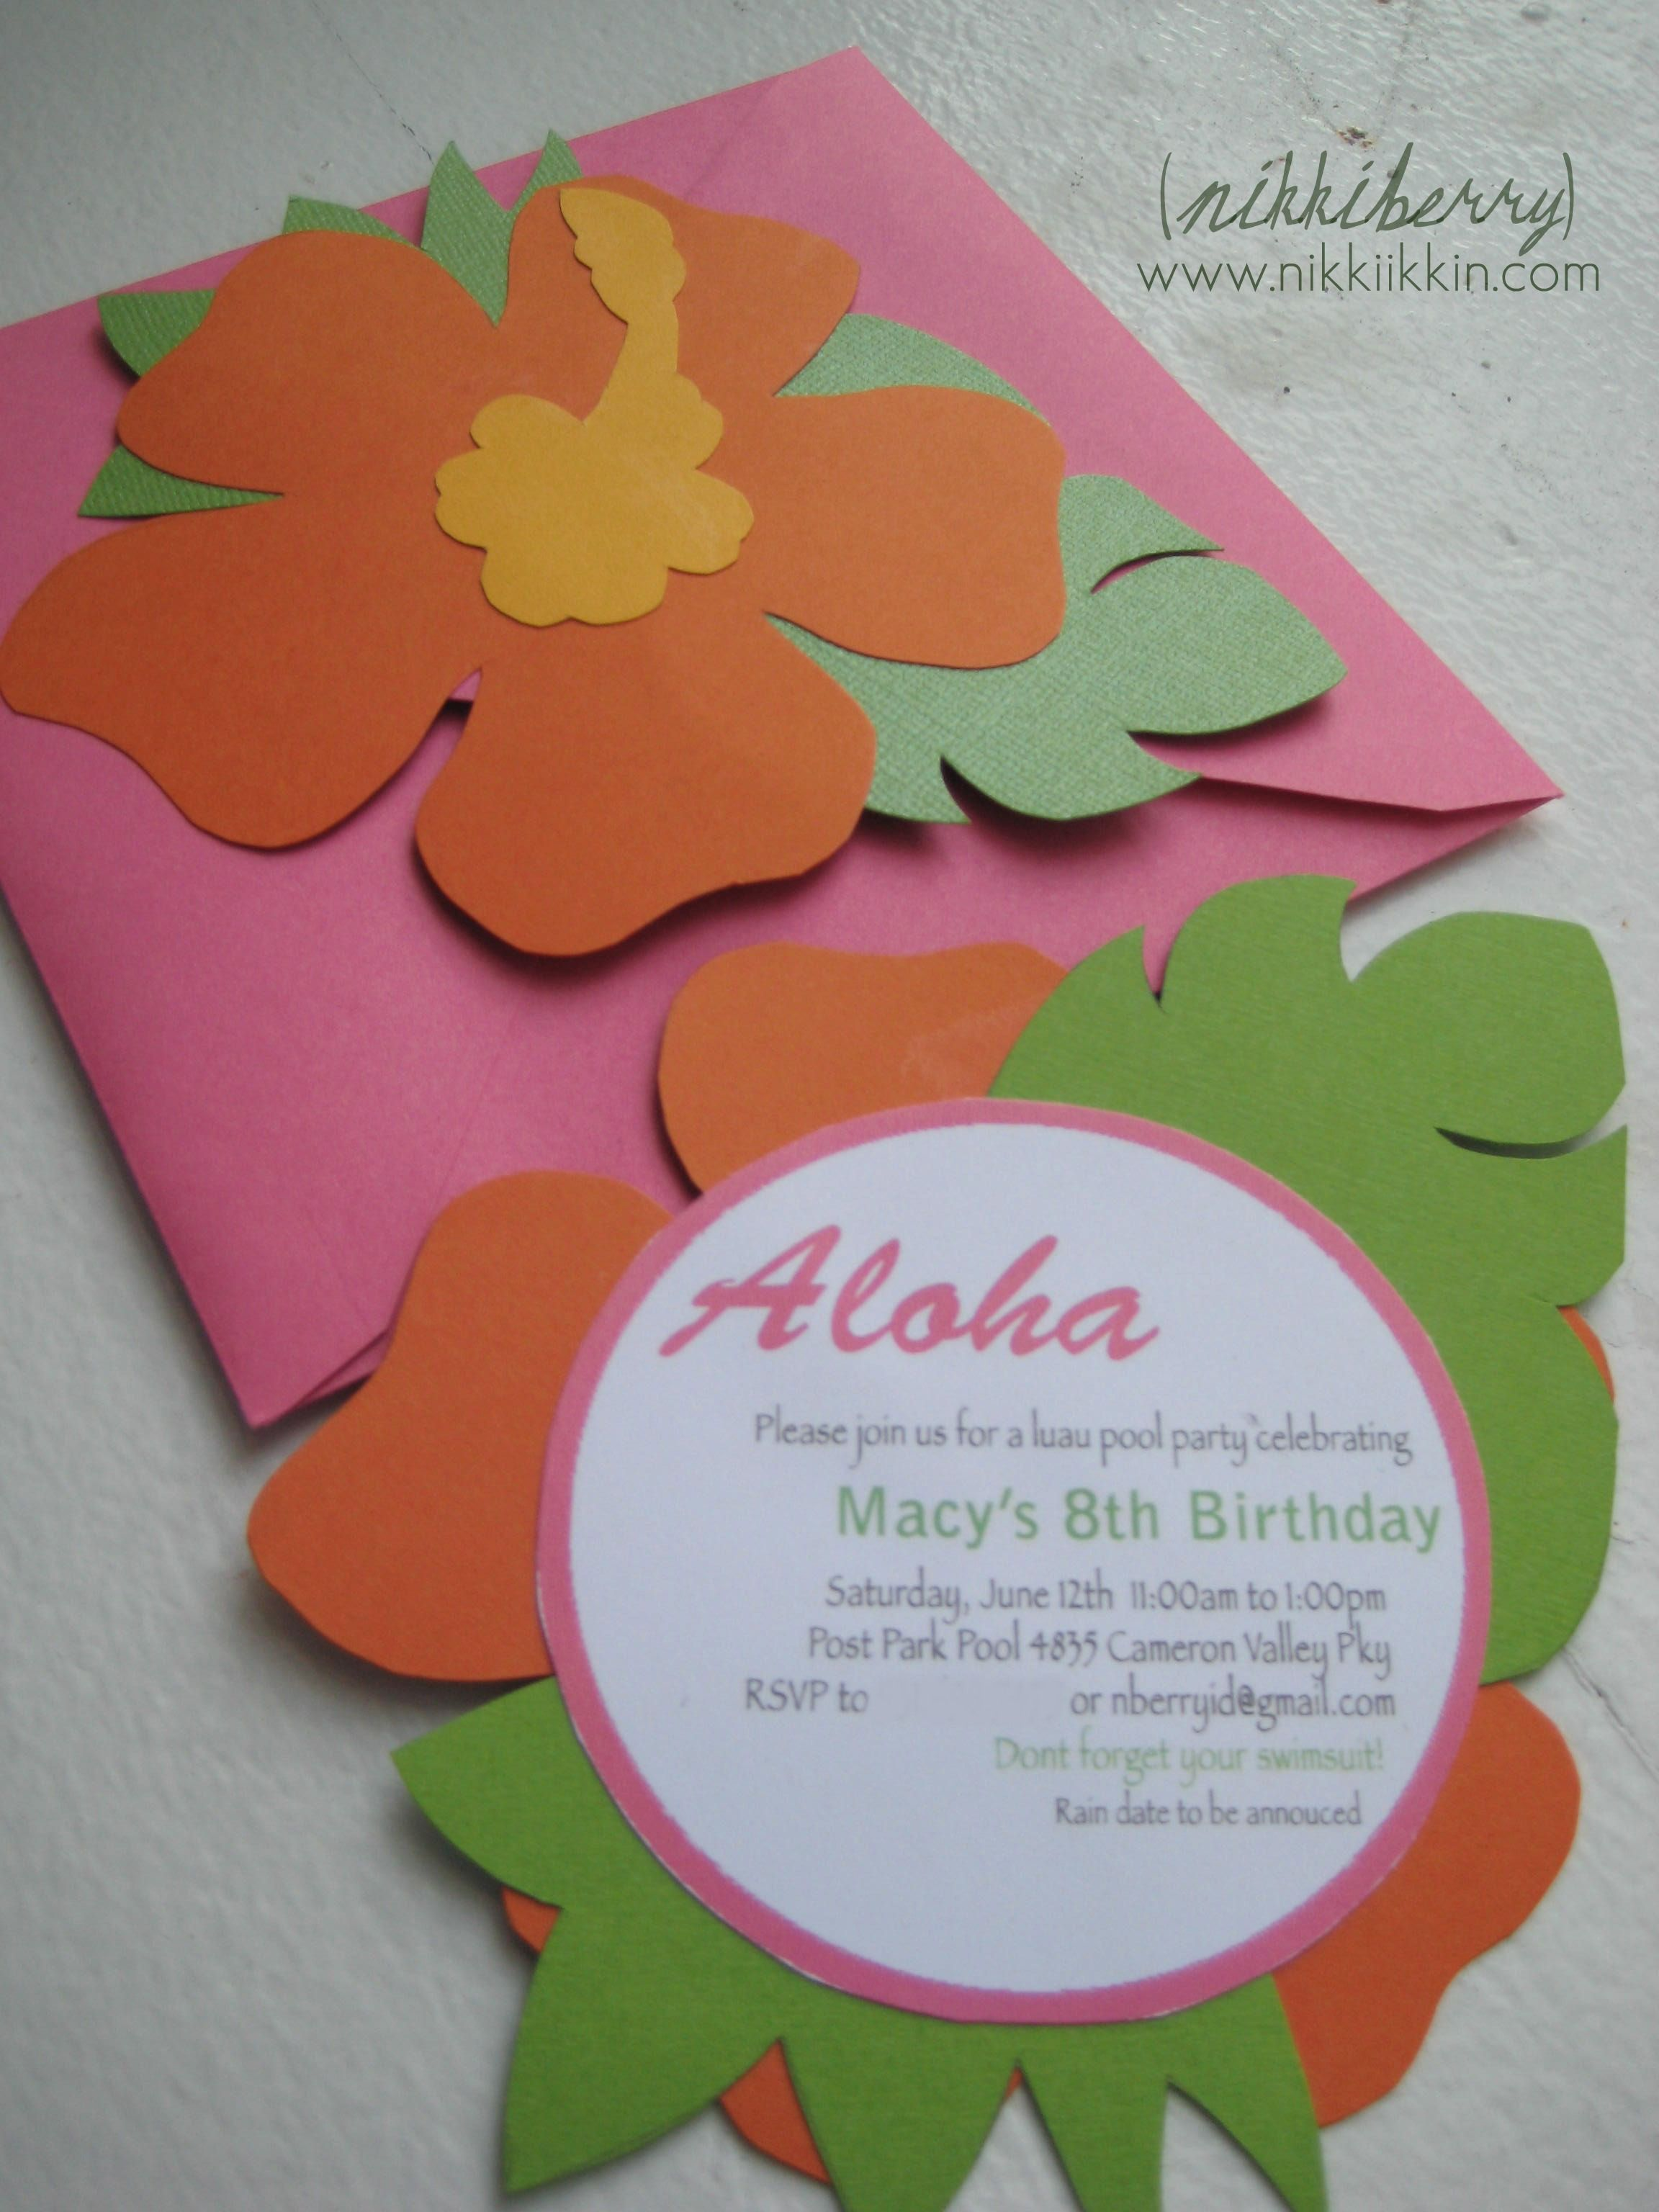 hawaiian birthday invitations | Hawaiian Birthday Party | NikkiikkiN ...